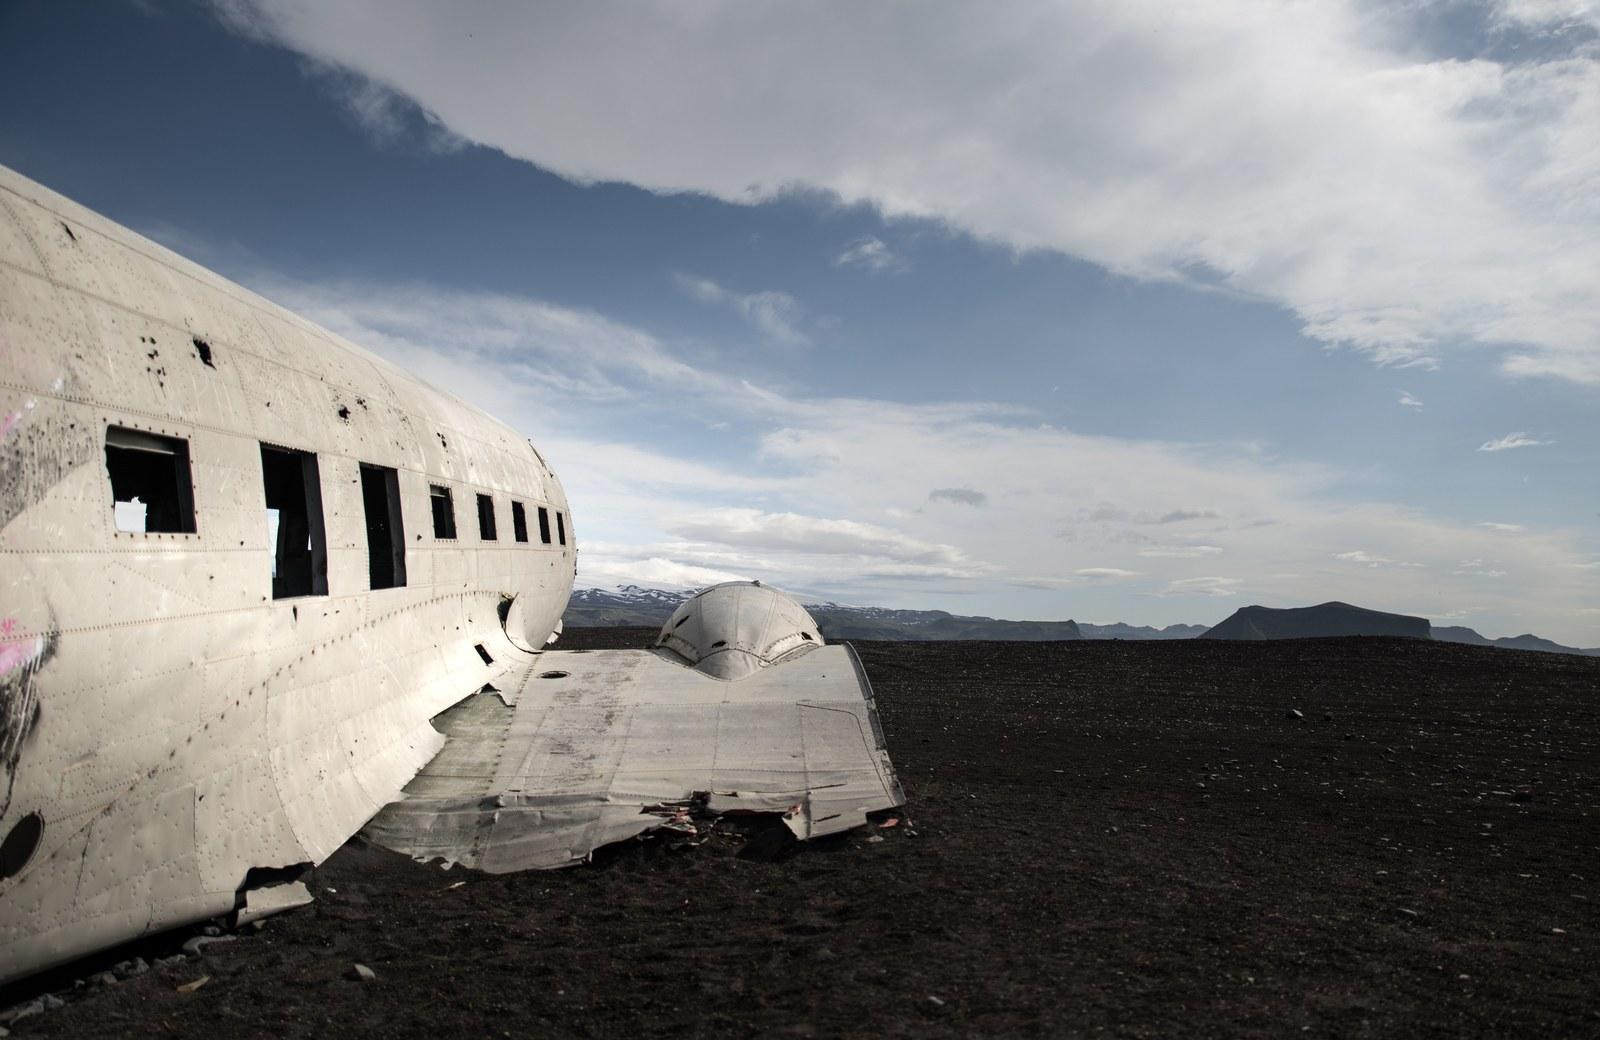 L'avion abandonné d'Islande Solheimasandur